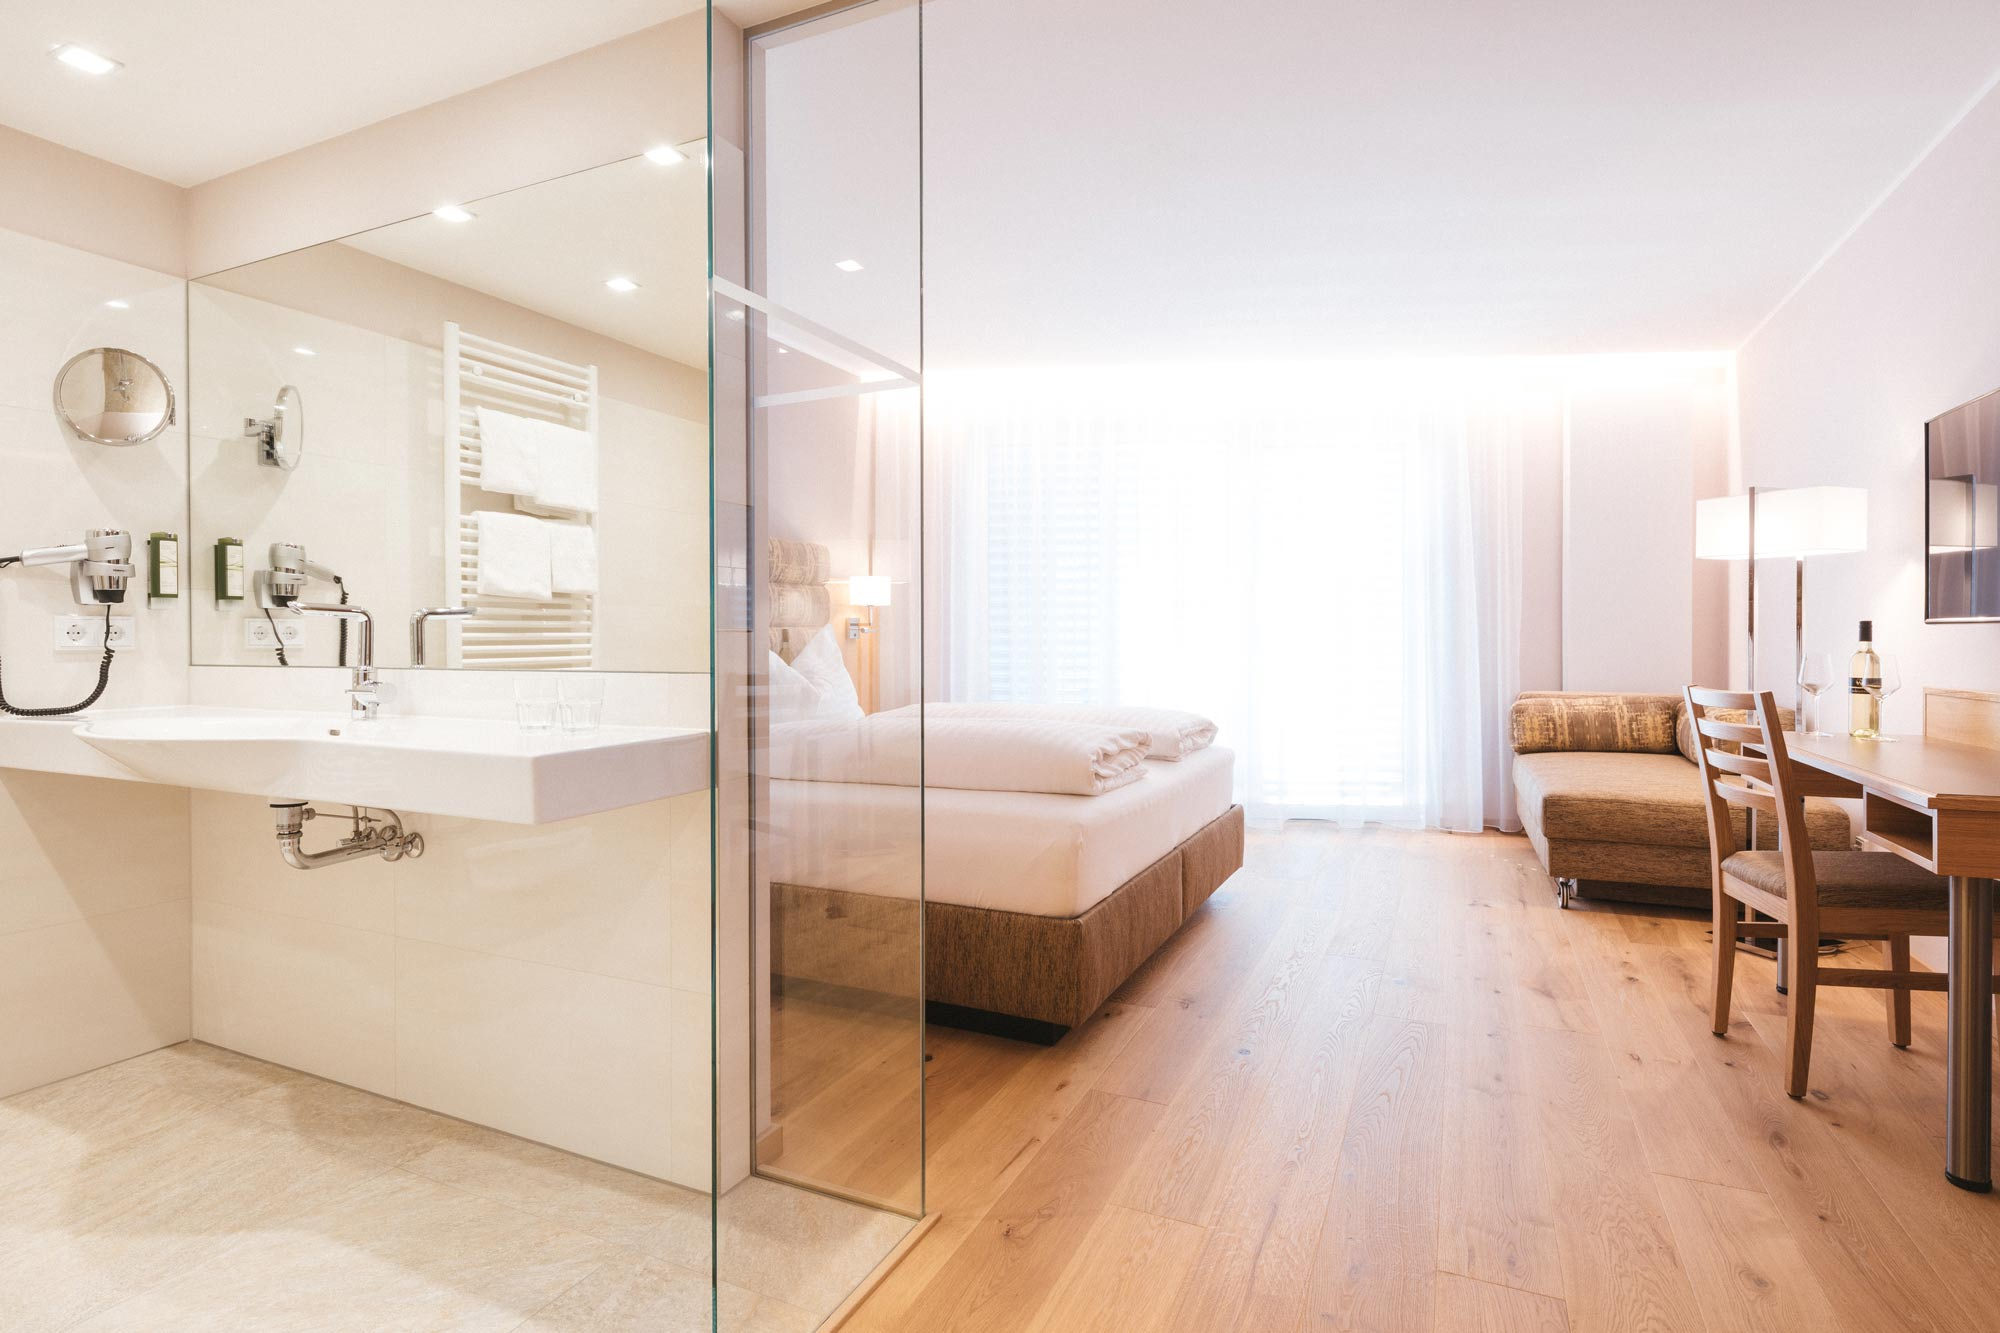 Doppelzimmer Komfort Bad